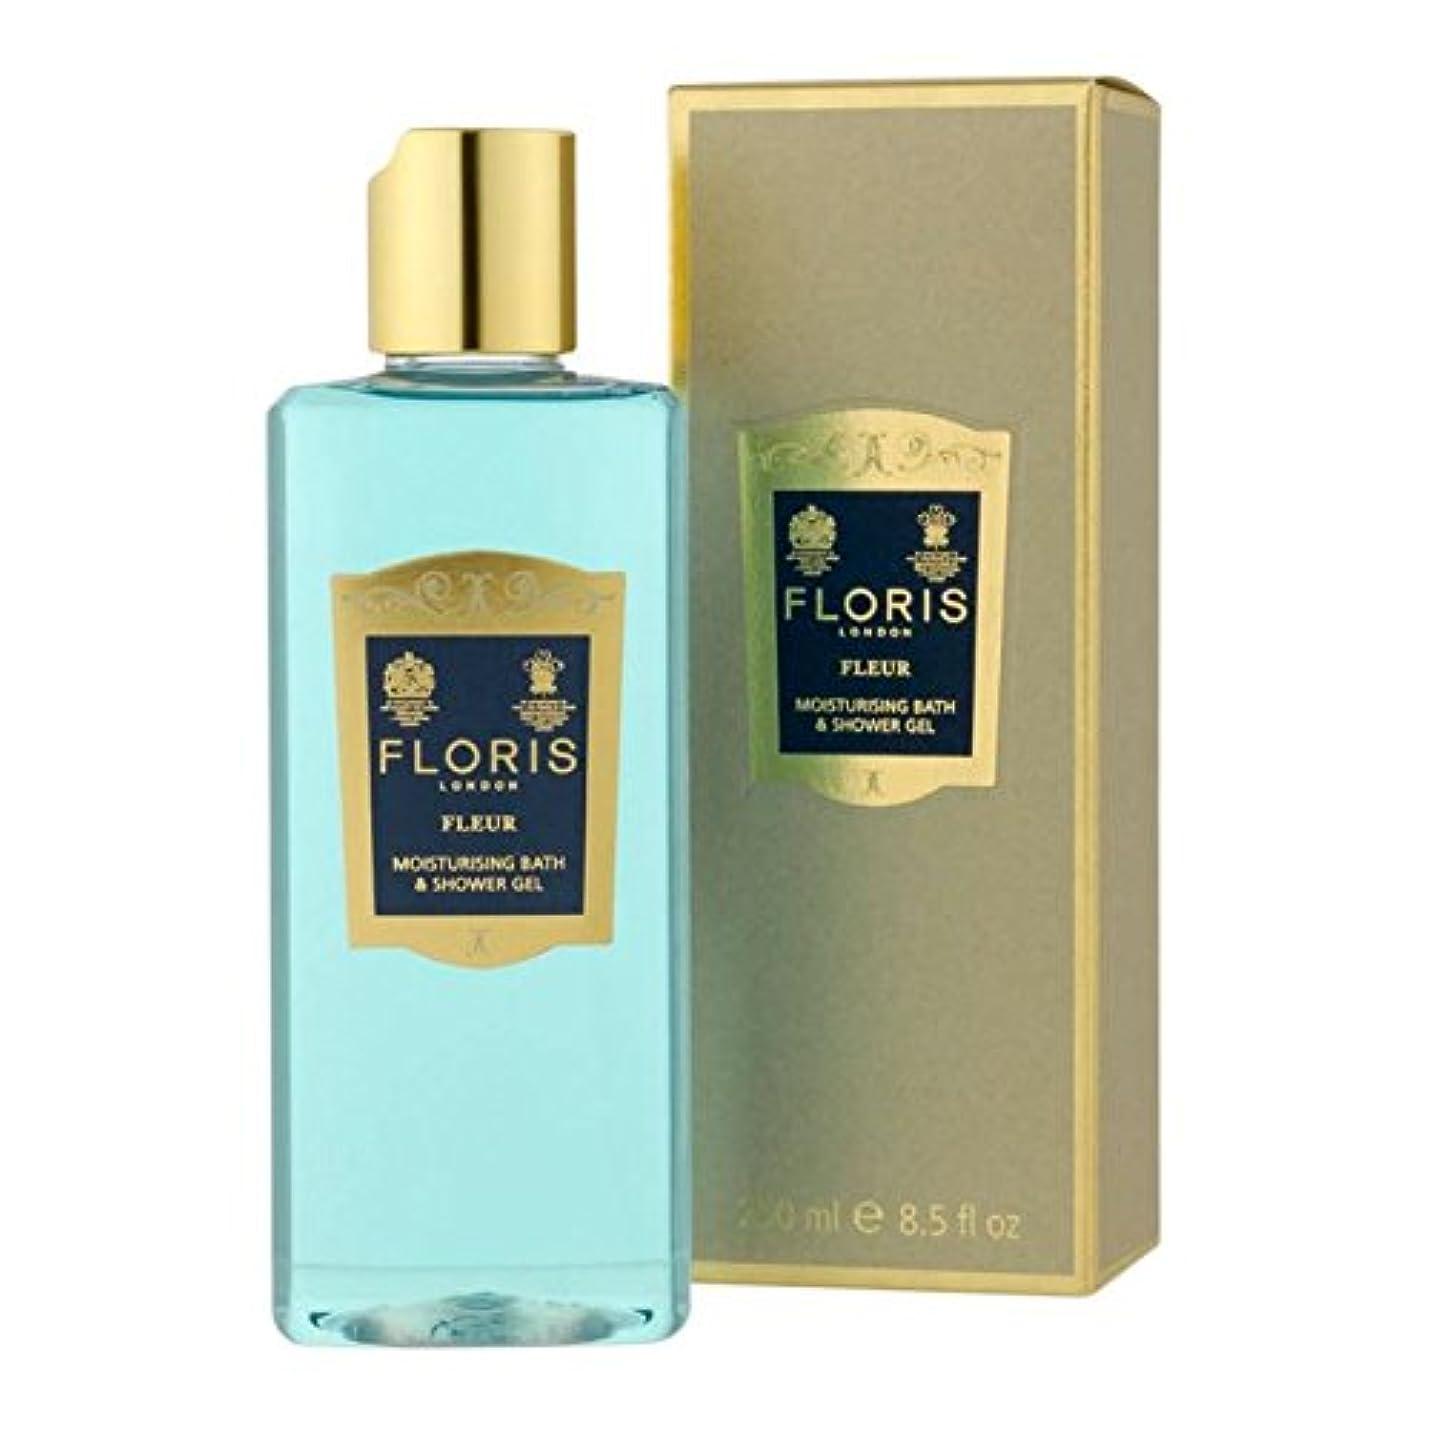 [Floris ] フロリスフルール保湿入浴やシャワージェル250ミリリットル - Floris Fleur Moisturising Bath and Shower Gel 250ml [並行輸入品]